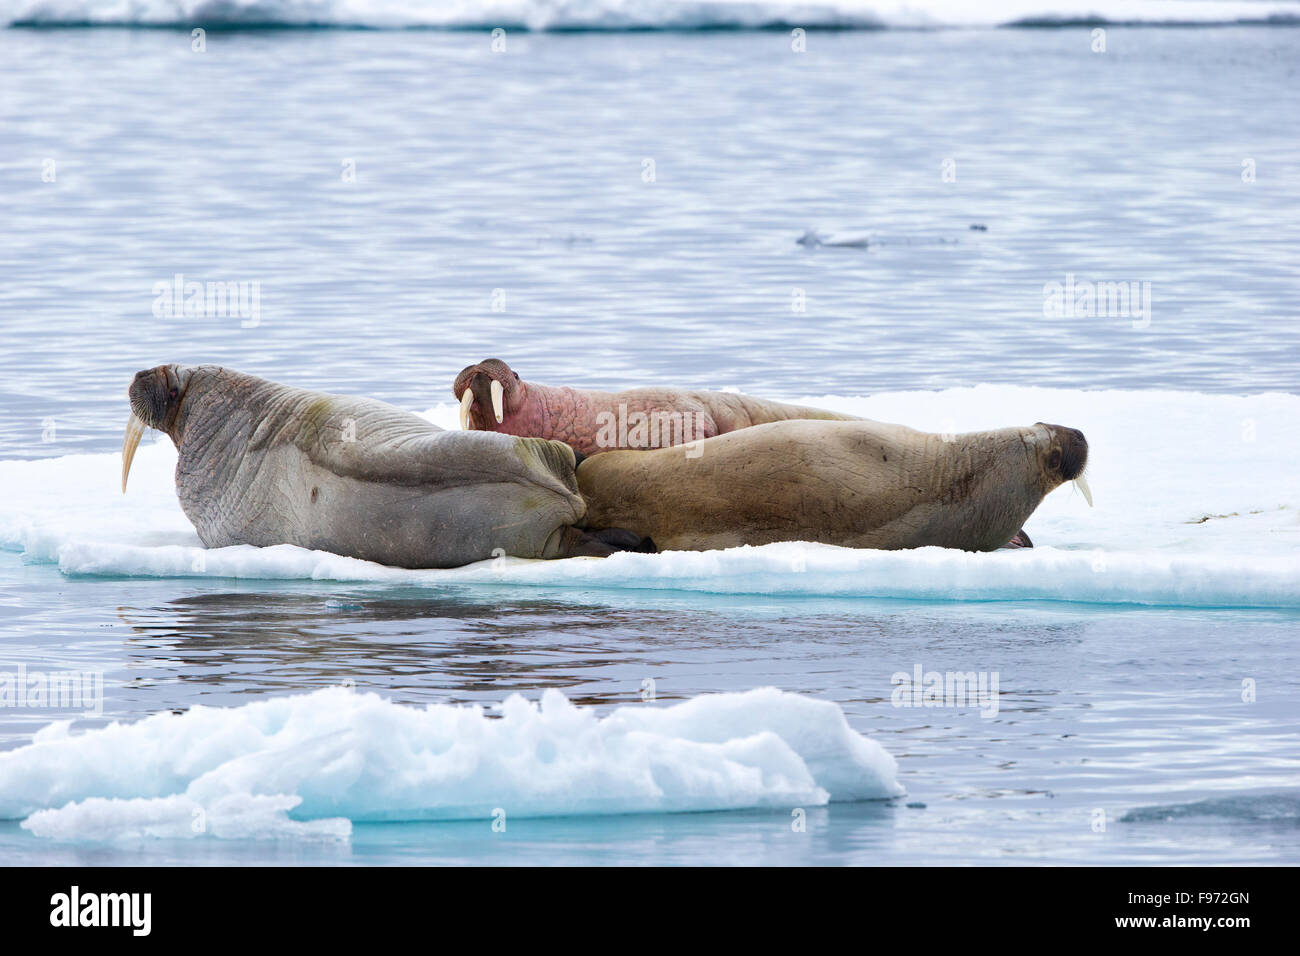 Atlantic Walruses Stock Photos & Atlantic Walruses Stock